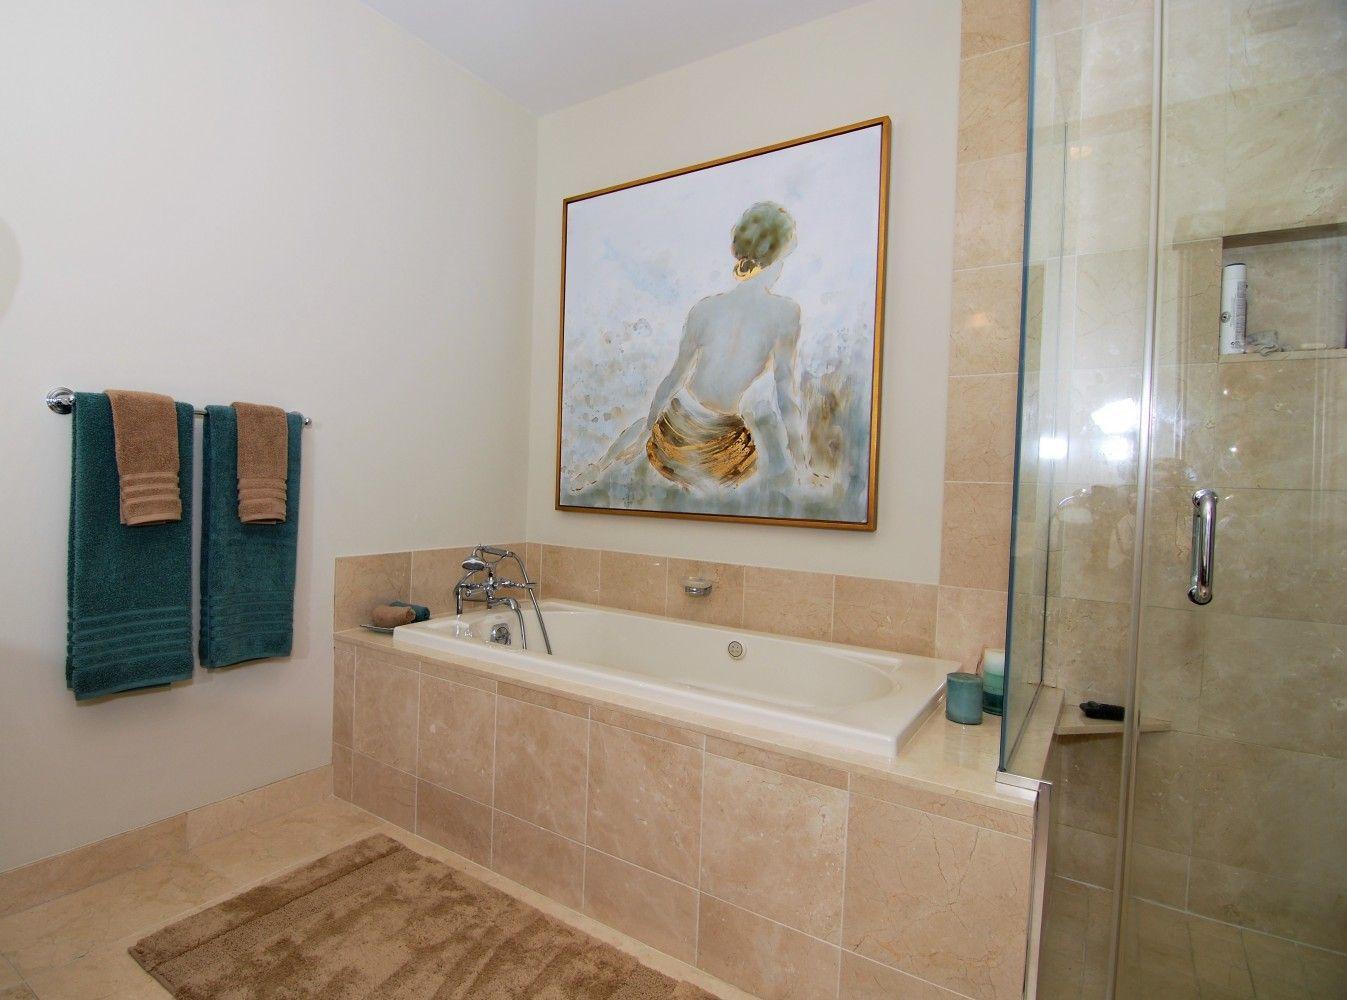 Contemporary bathroom inspiration! This gorgeous bathroom ...